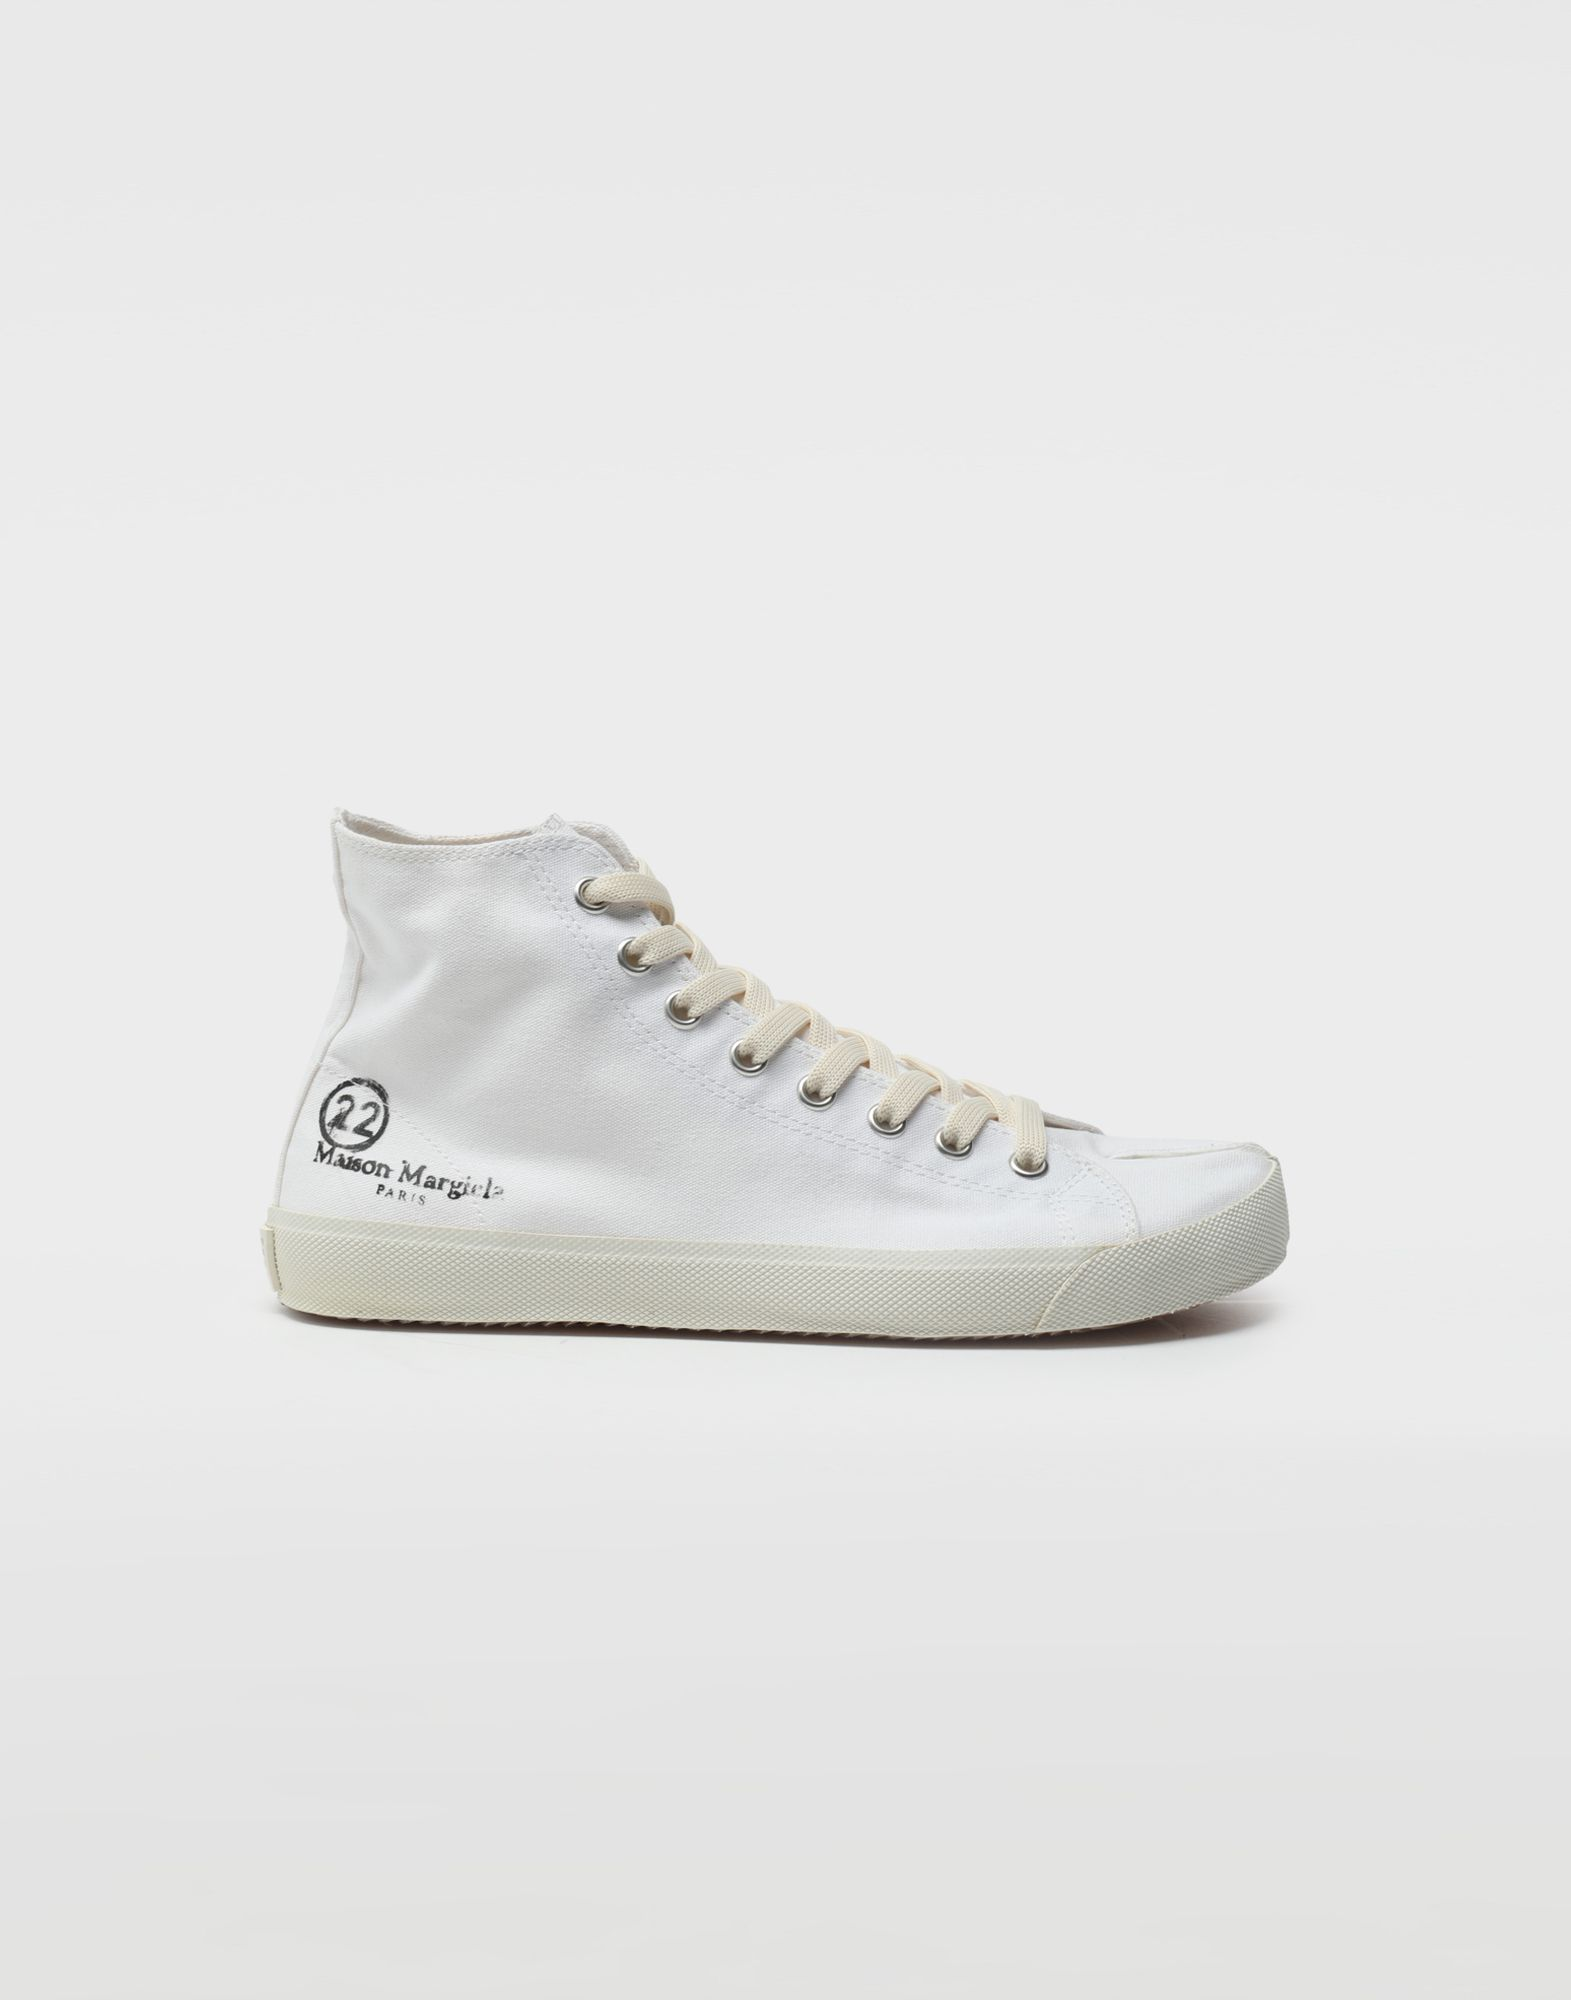 MAISON MARGIELA Baskets montantes Tabi Sneakers Tabi Homme f